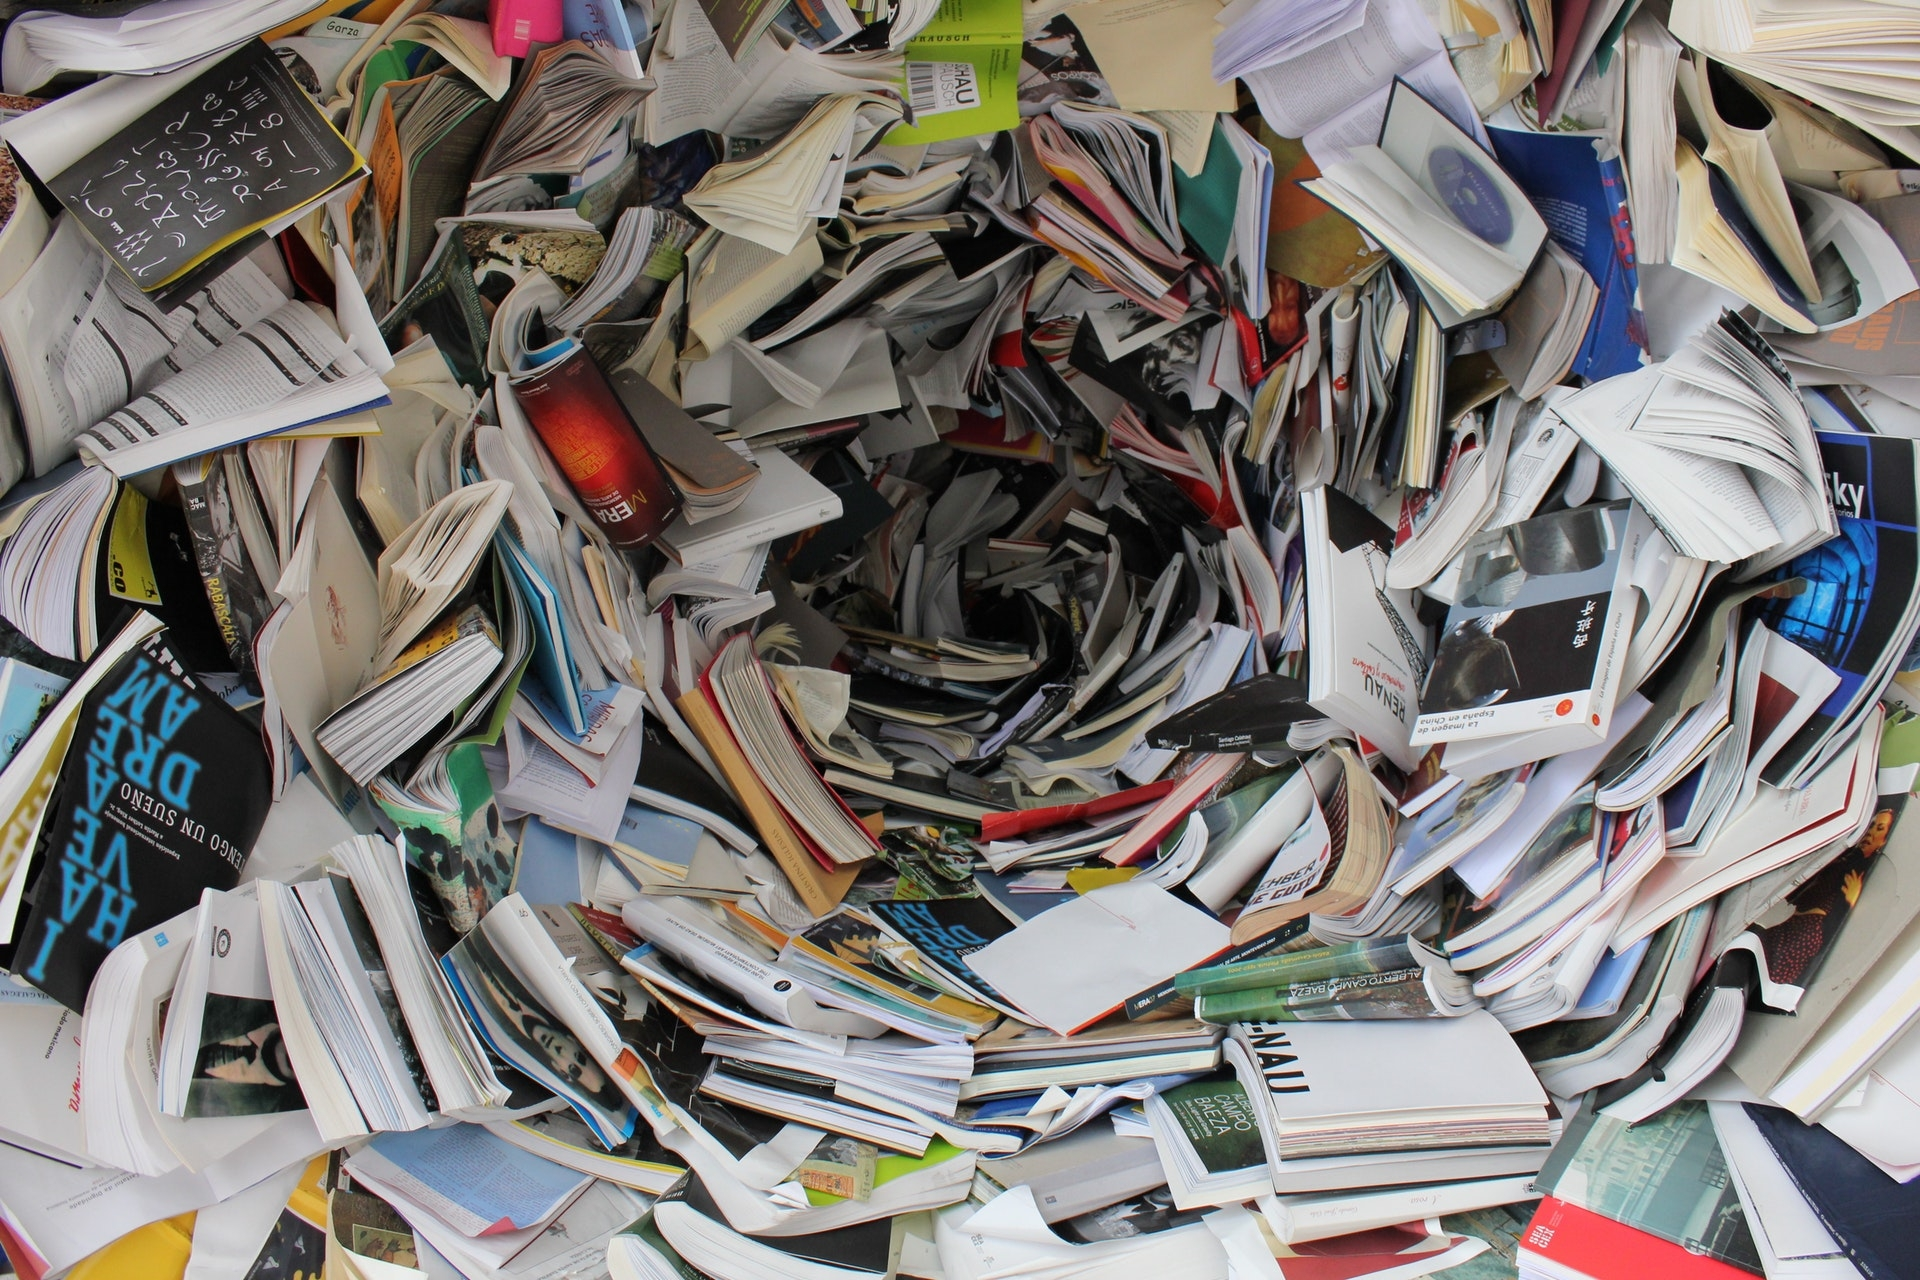 book-address-book-learning-learn-159751 (1).jpeg